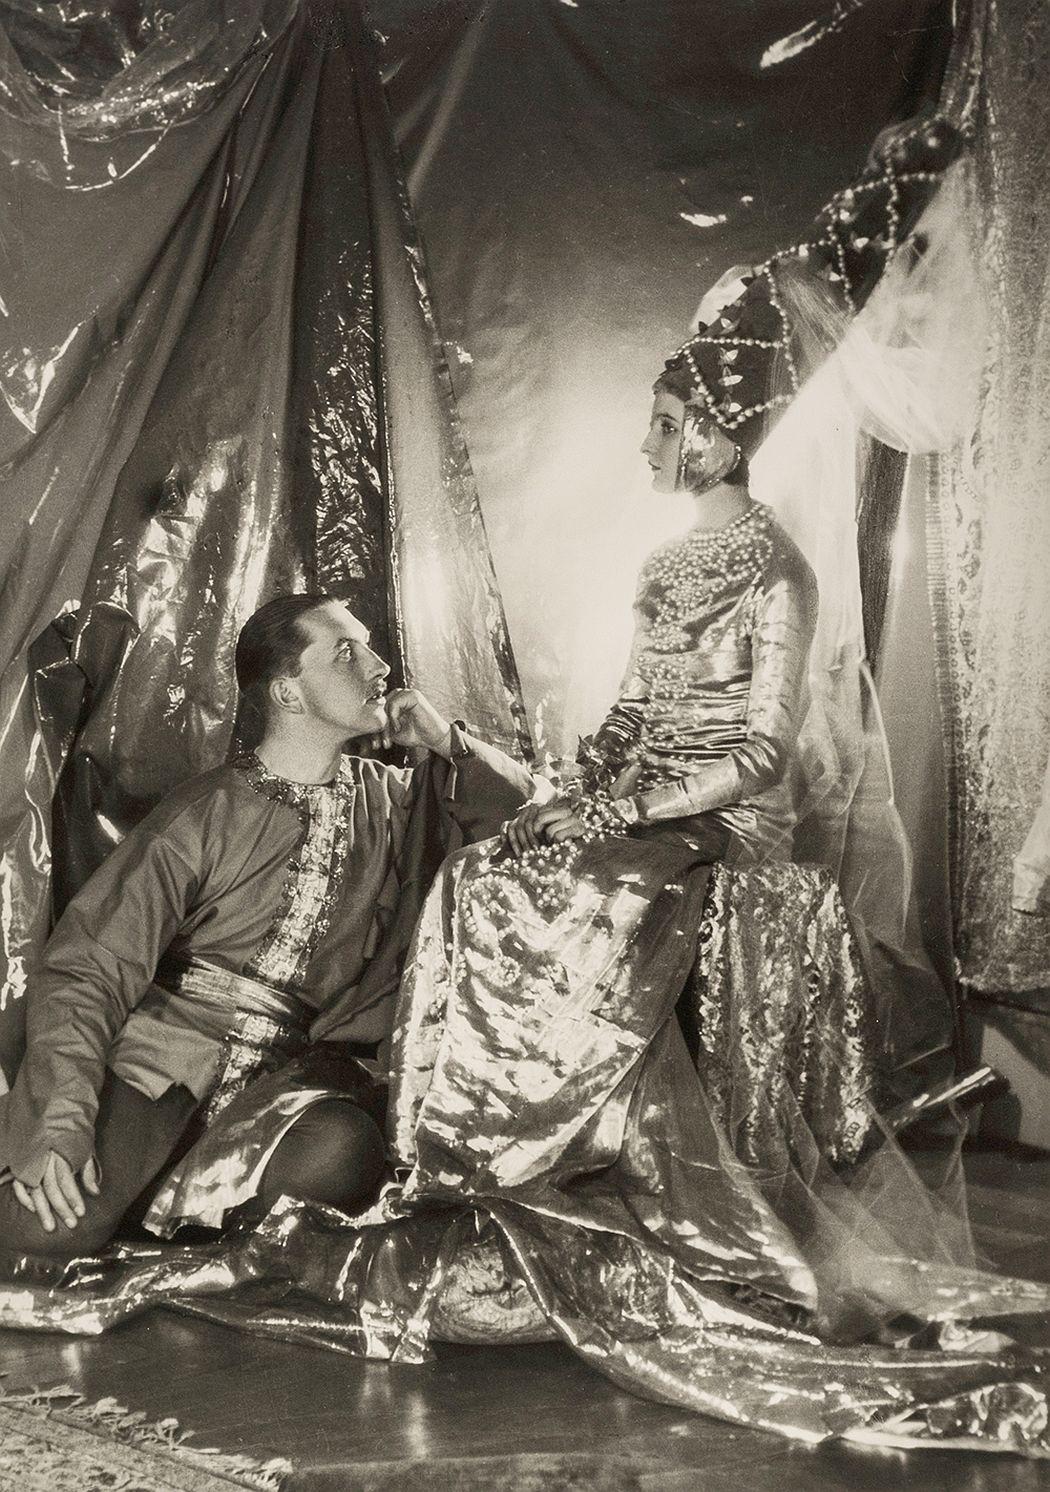 Baba Beaton and Prince Galitzine, 1927  Cecil Beaton